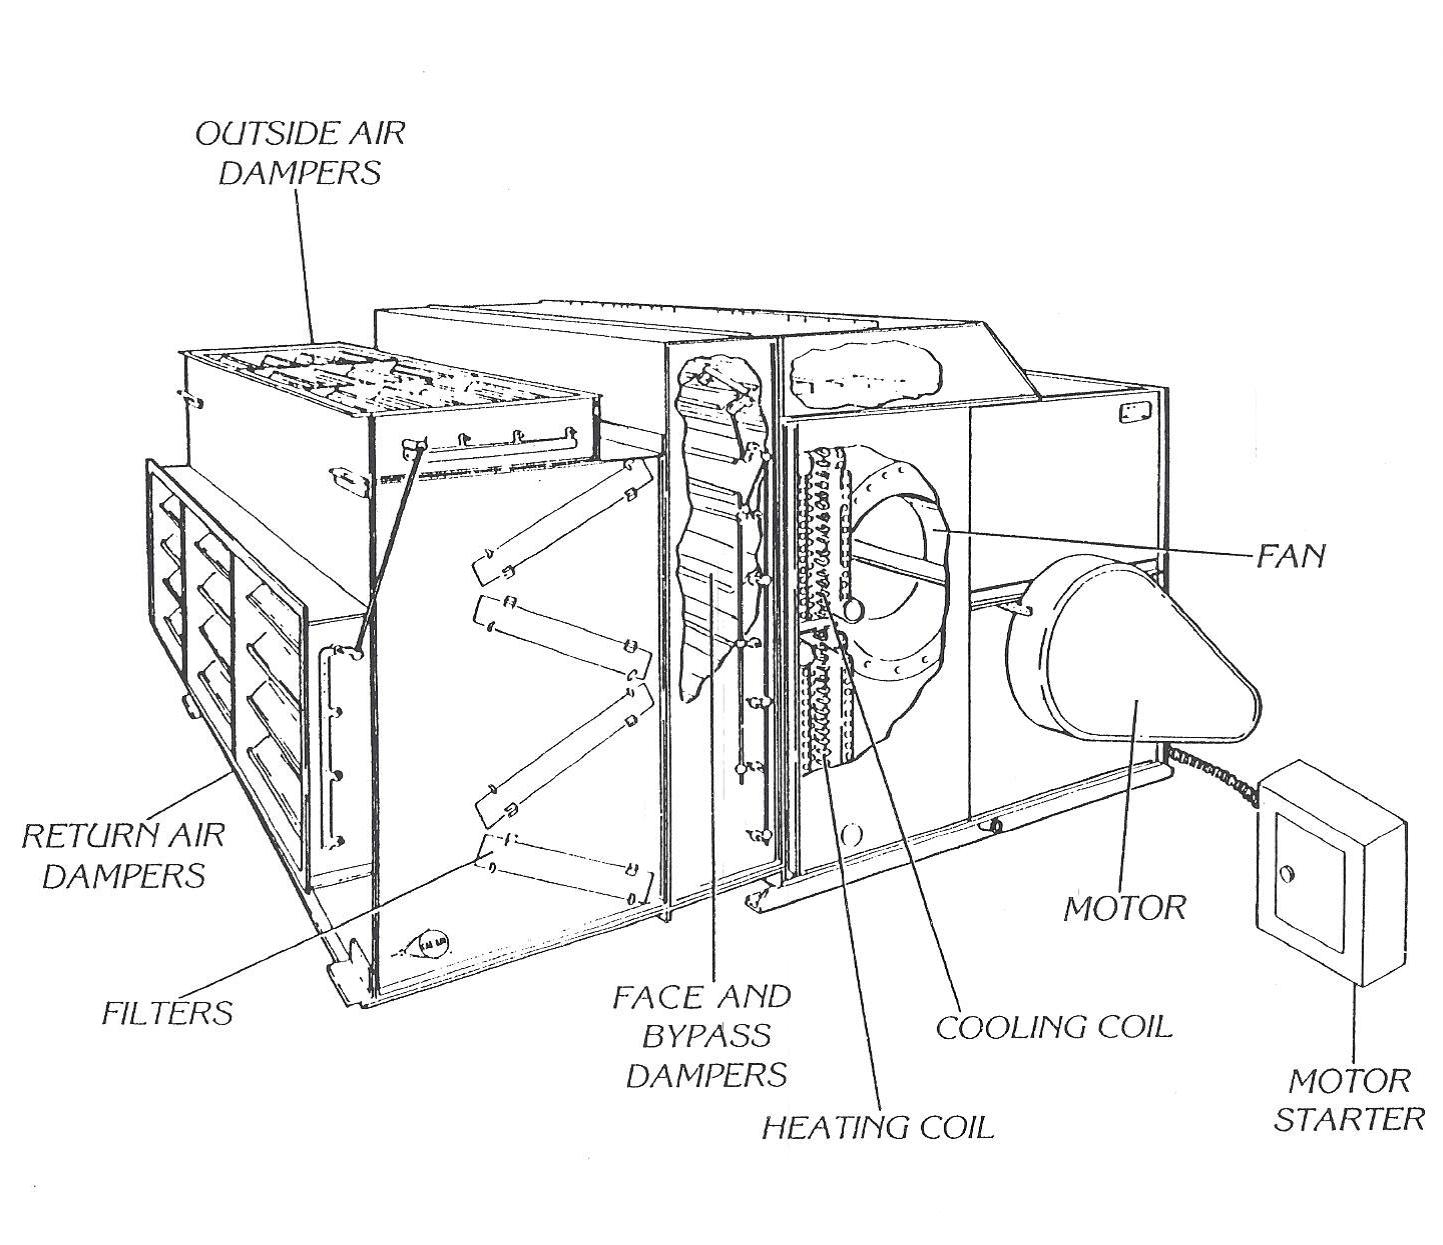 [DIAGRAM] Wiring Diagrams For Hvac Units FULL Version HD